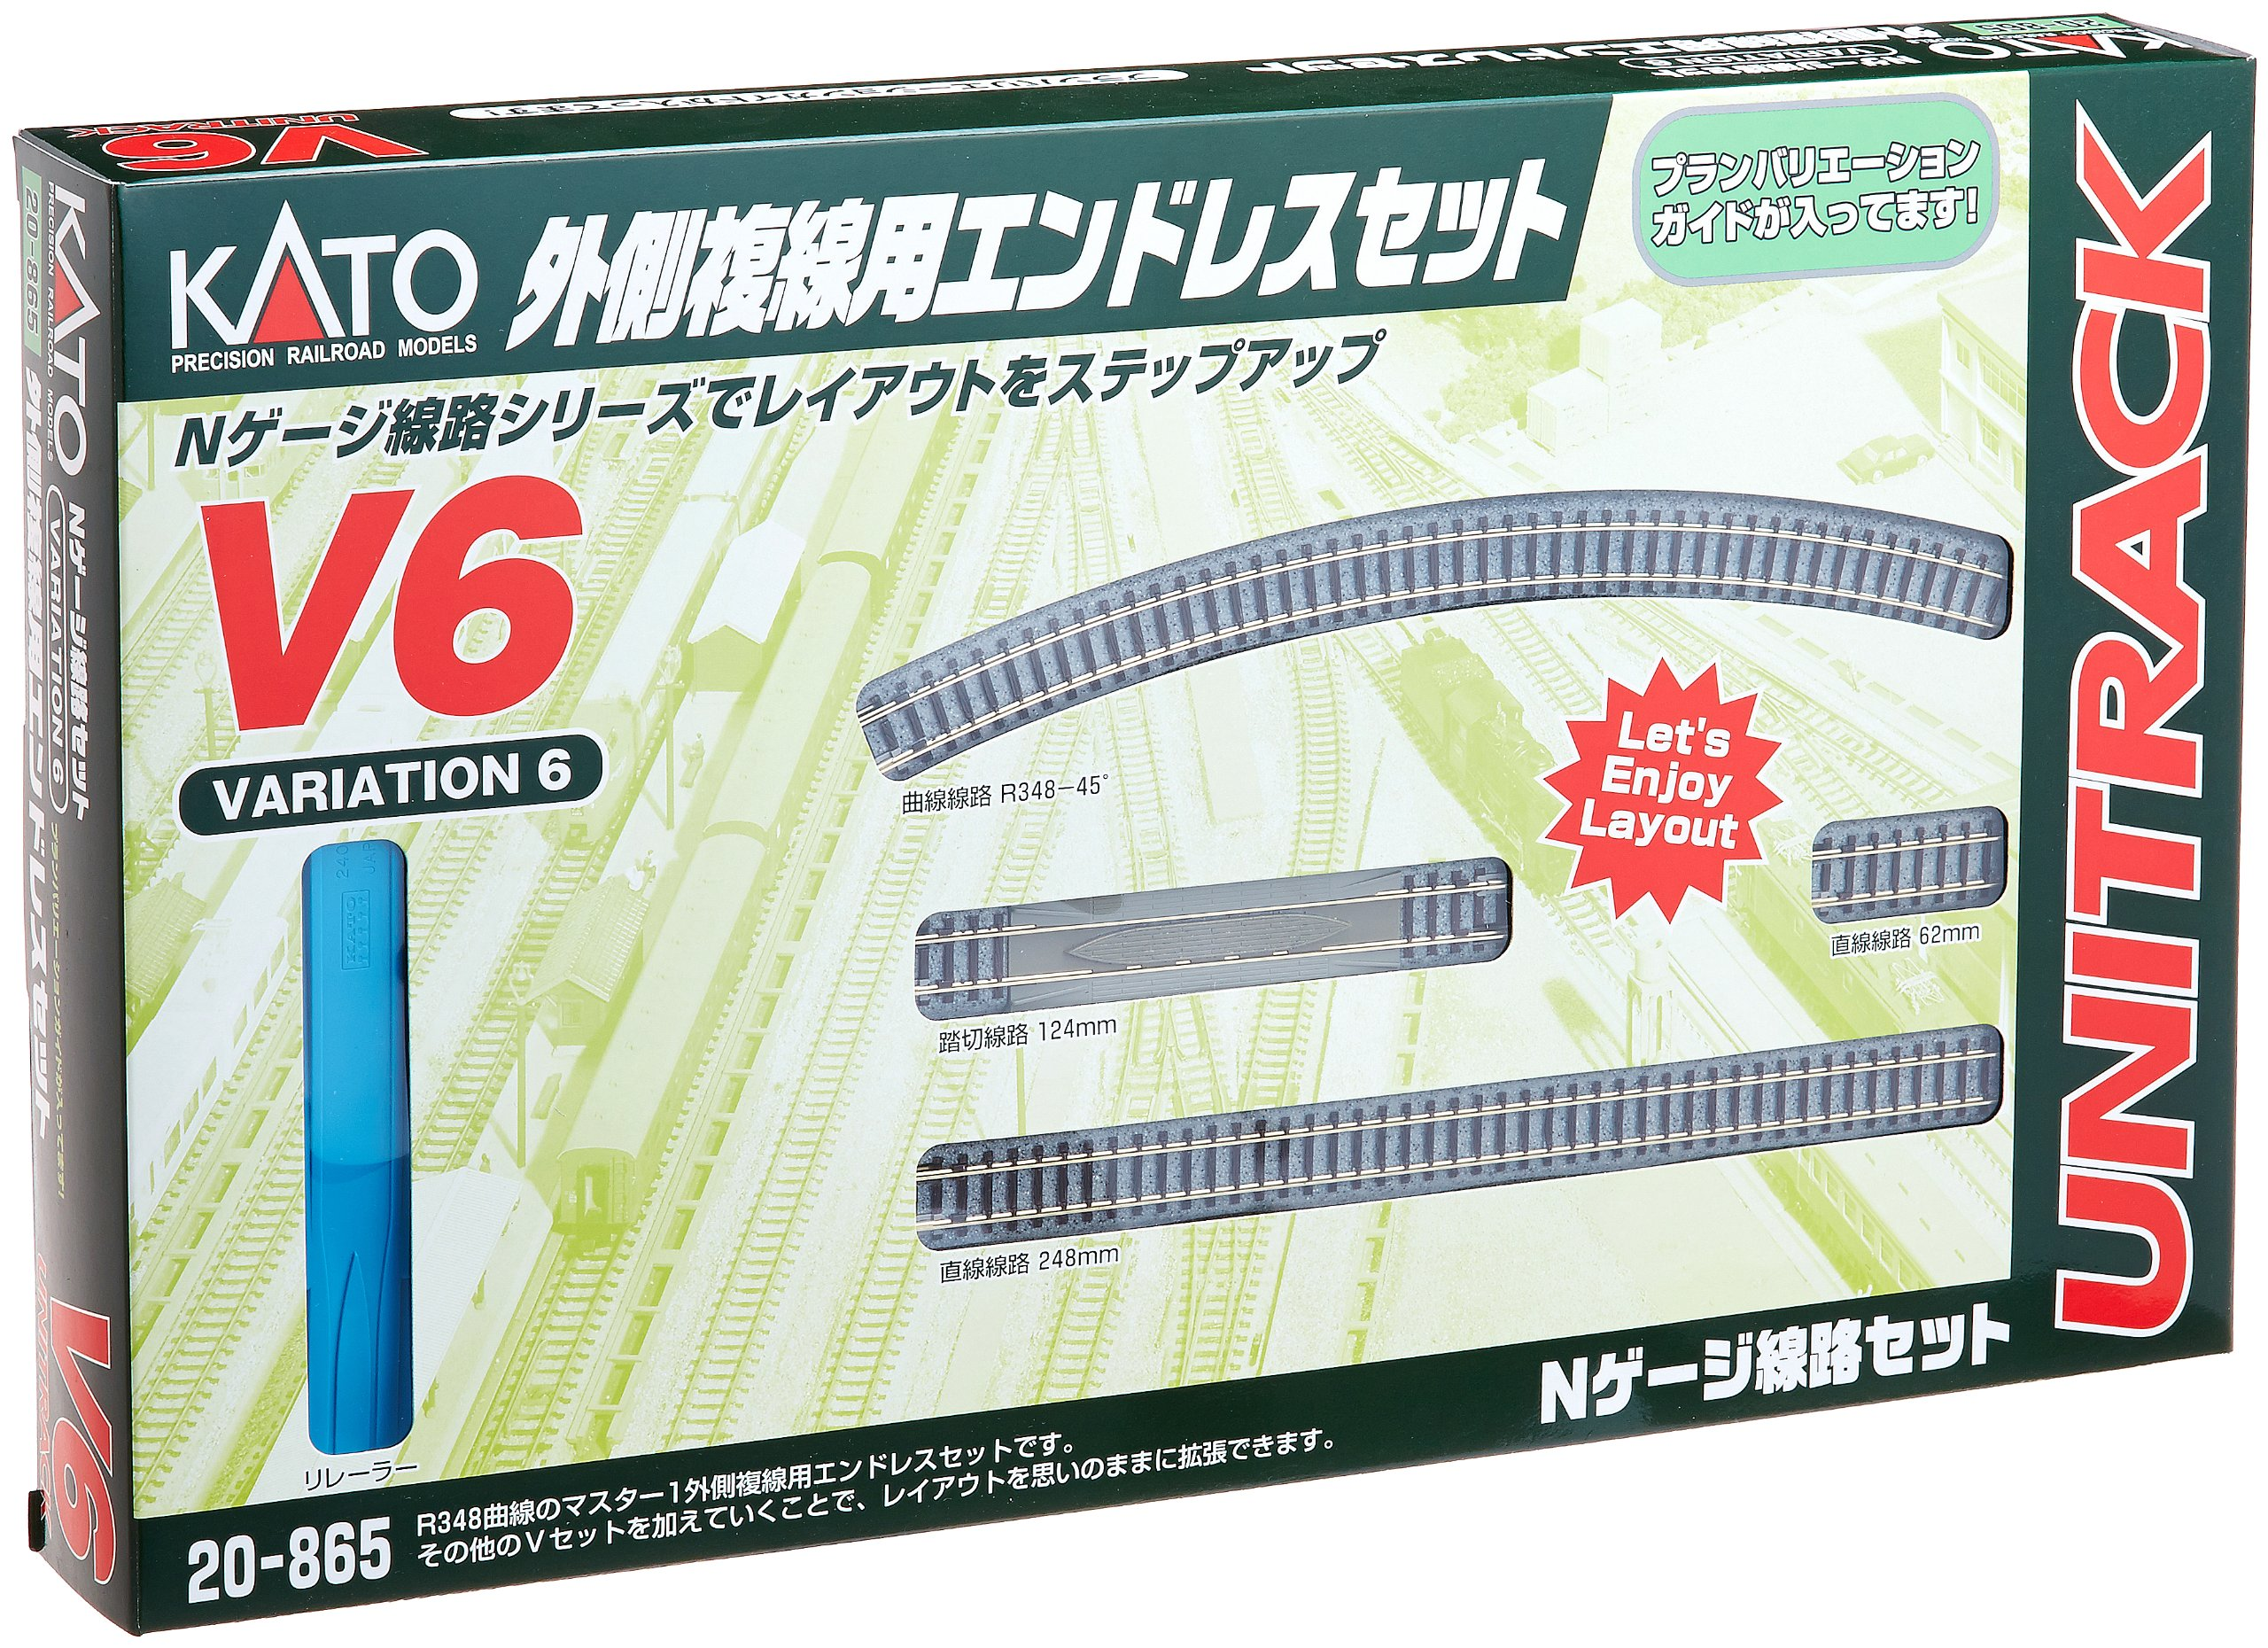 Kato 20-865 V6 Outer Oval Variation Pack